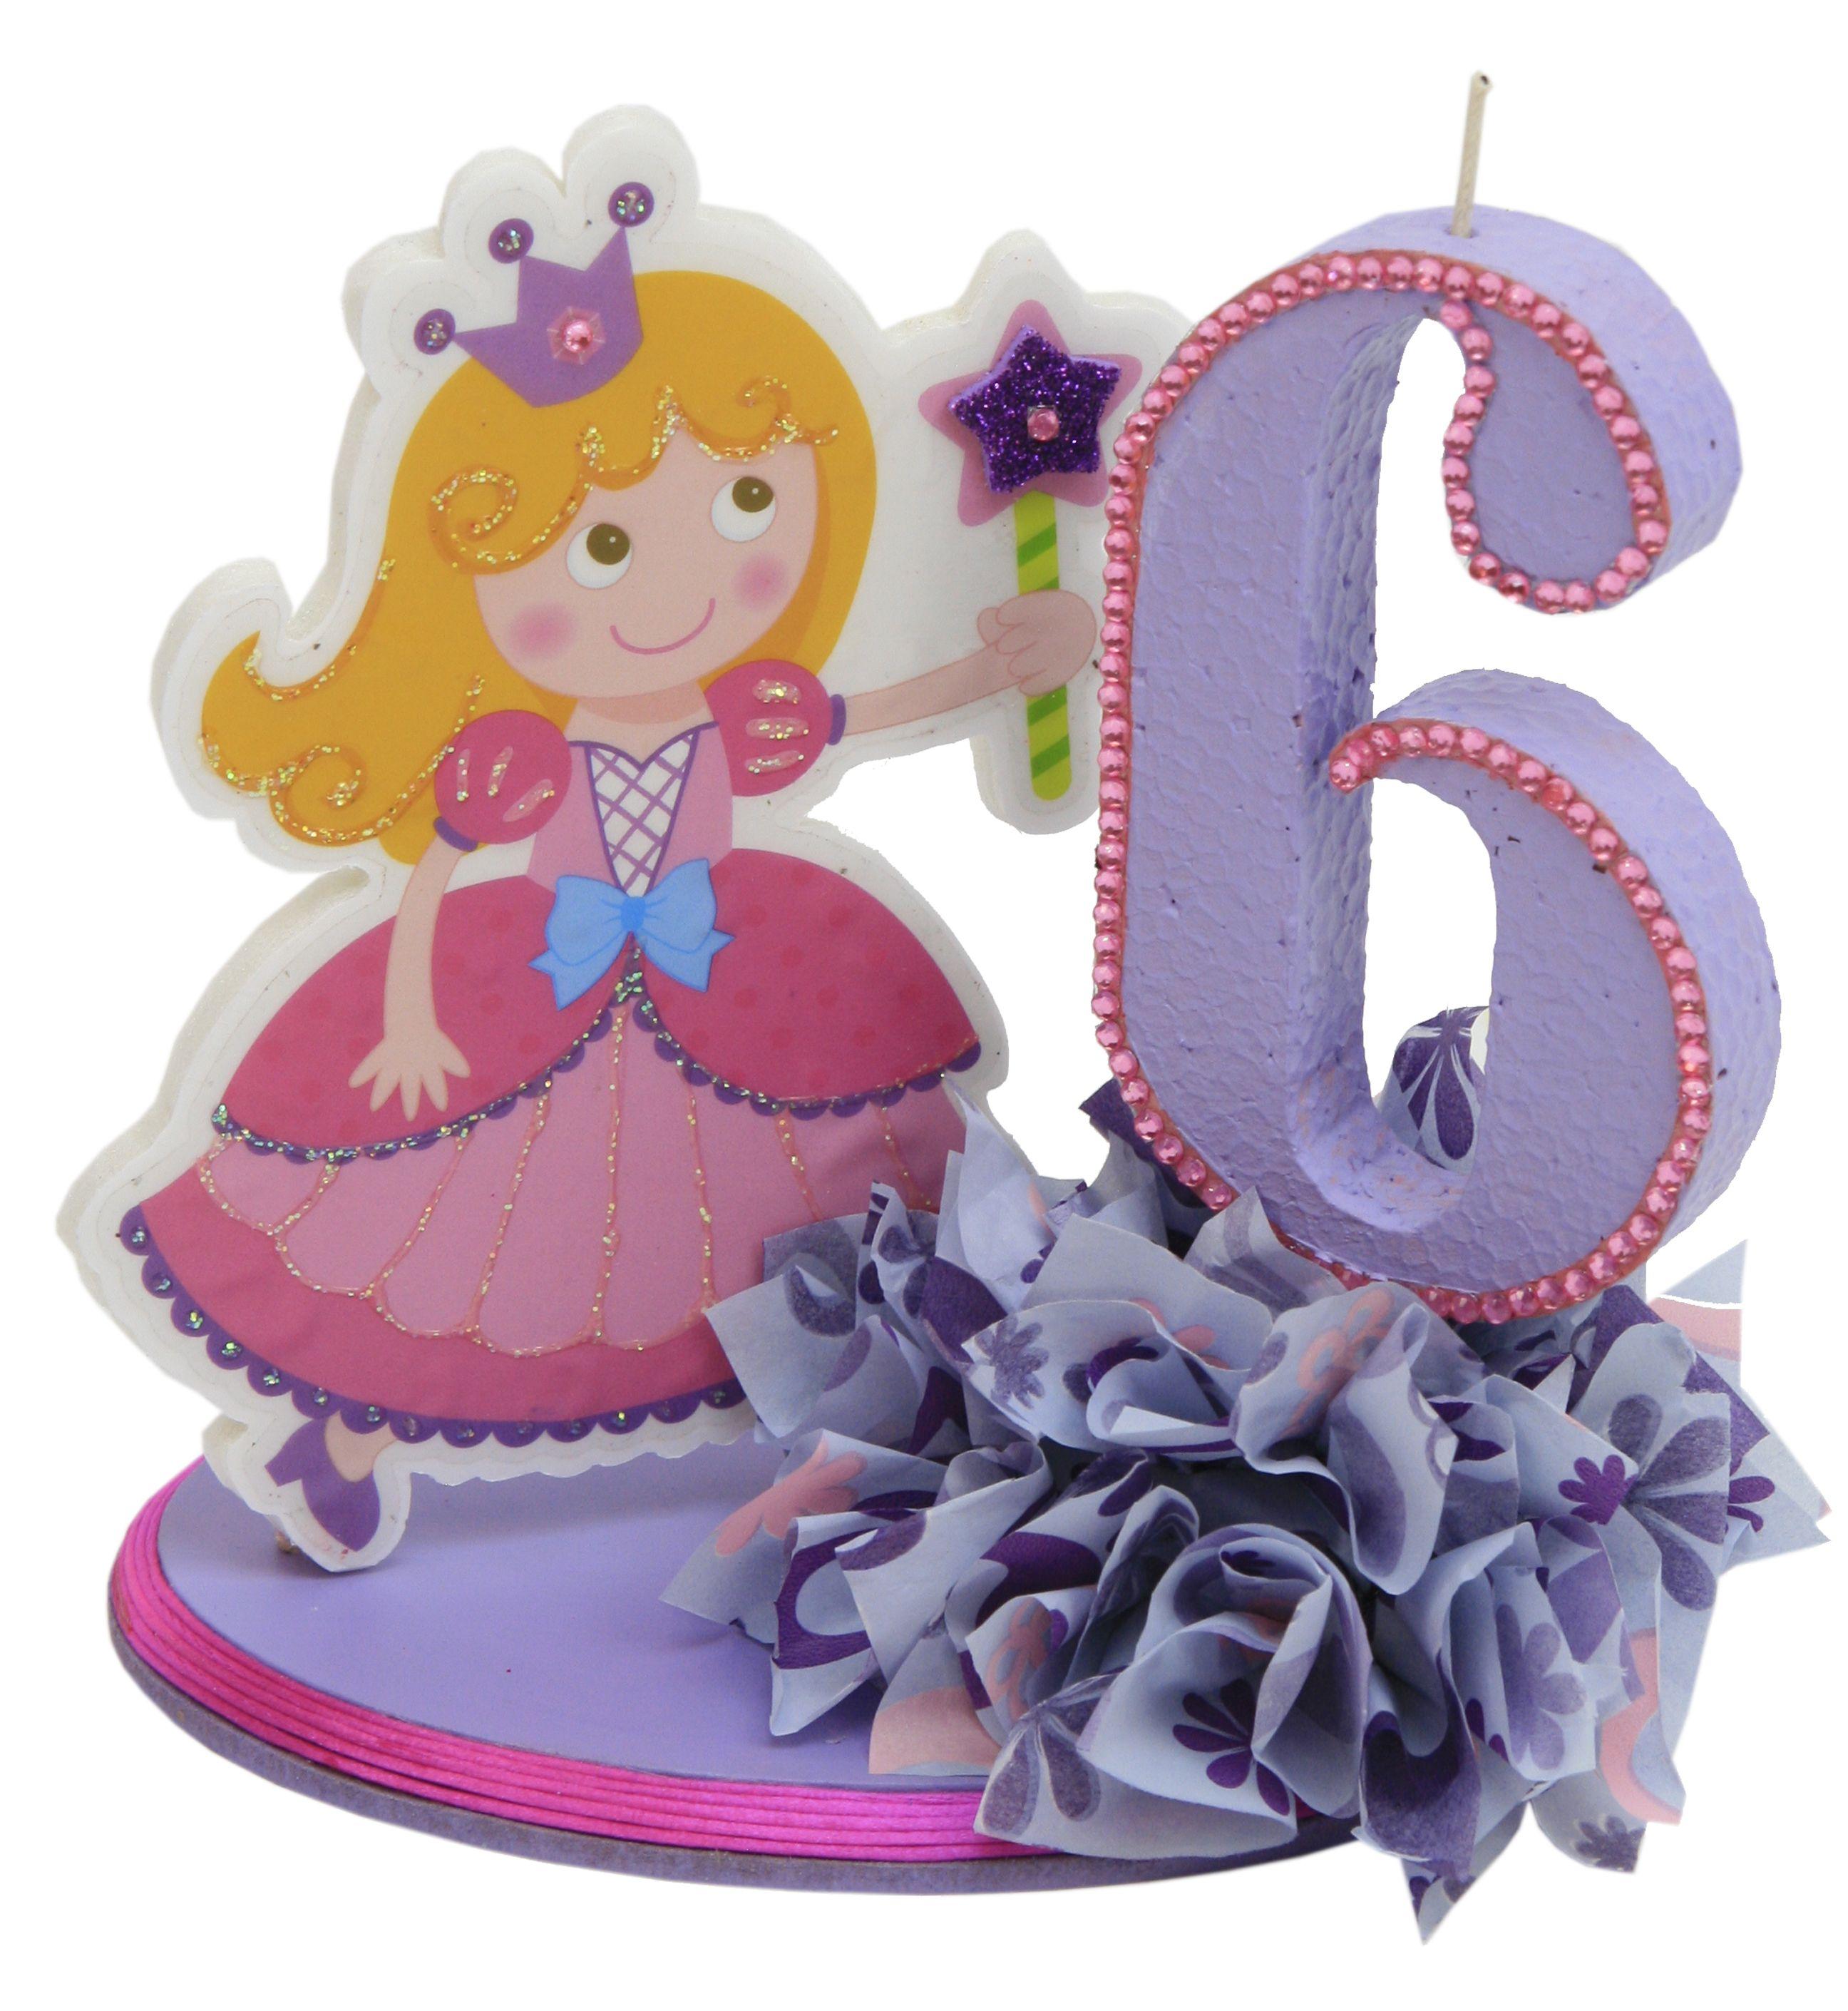 Decoraci n para pastel de fiestas infantiles princesa for Decoracion para nina